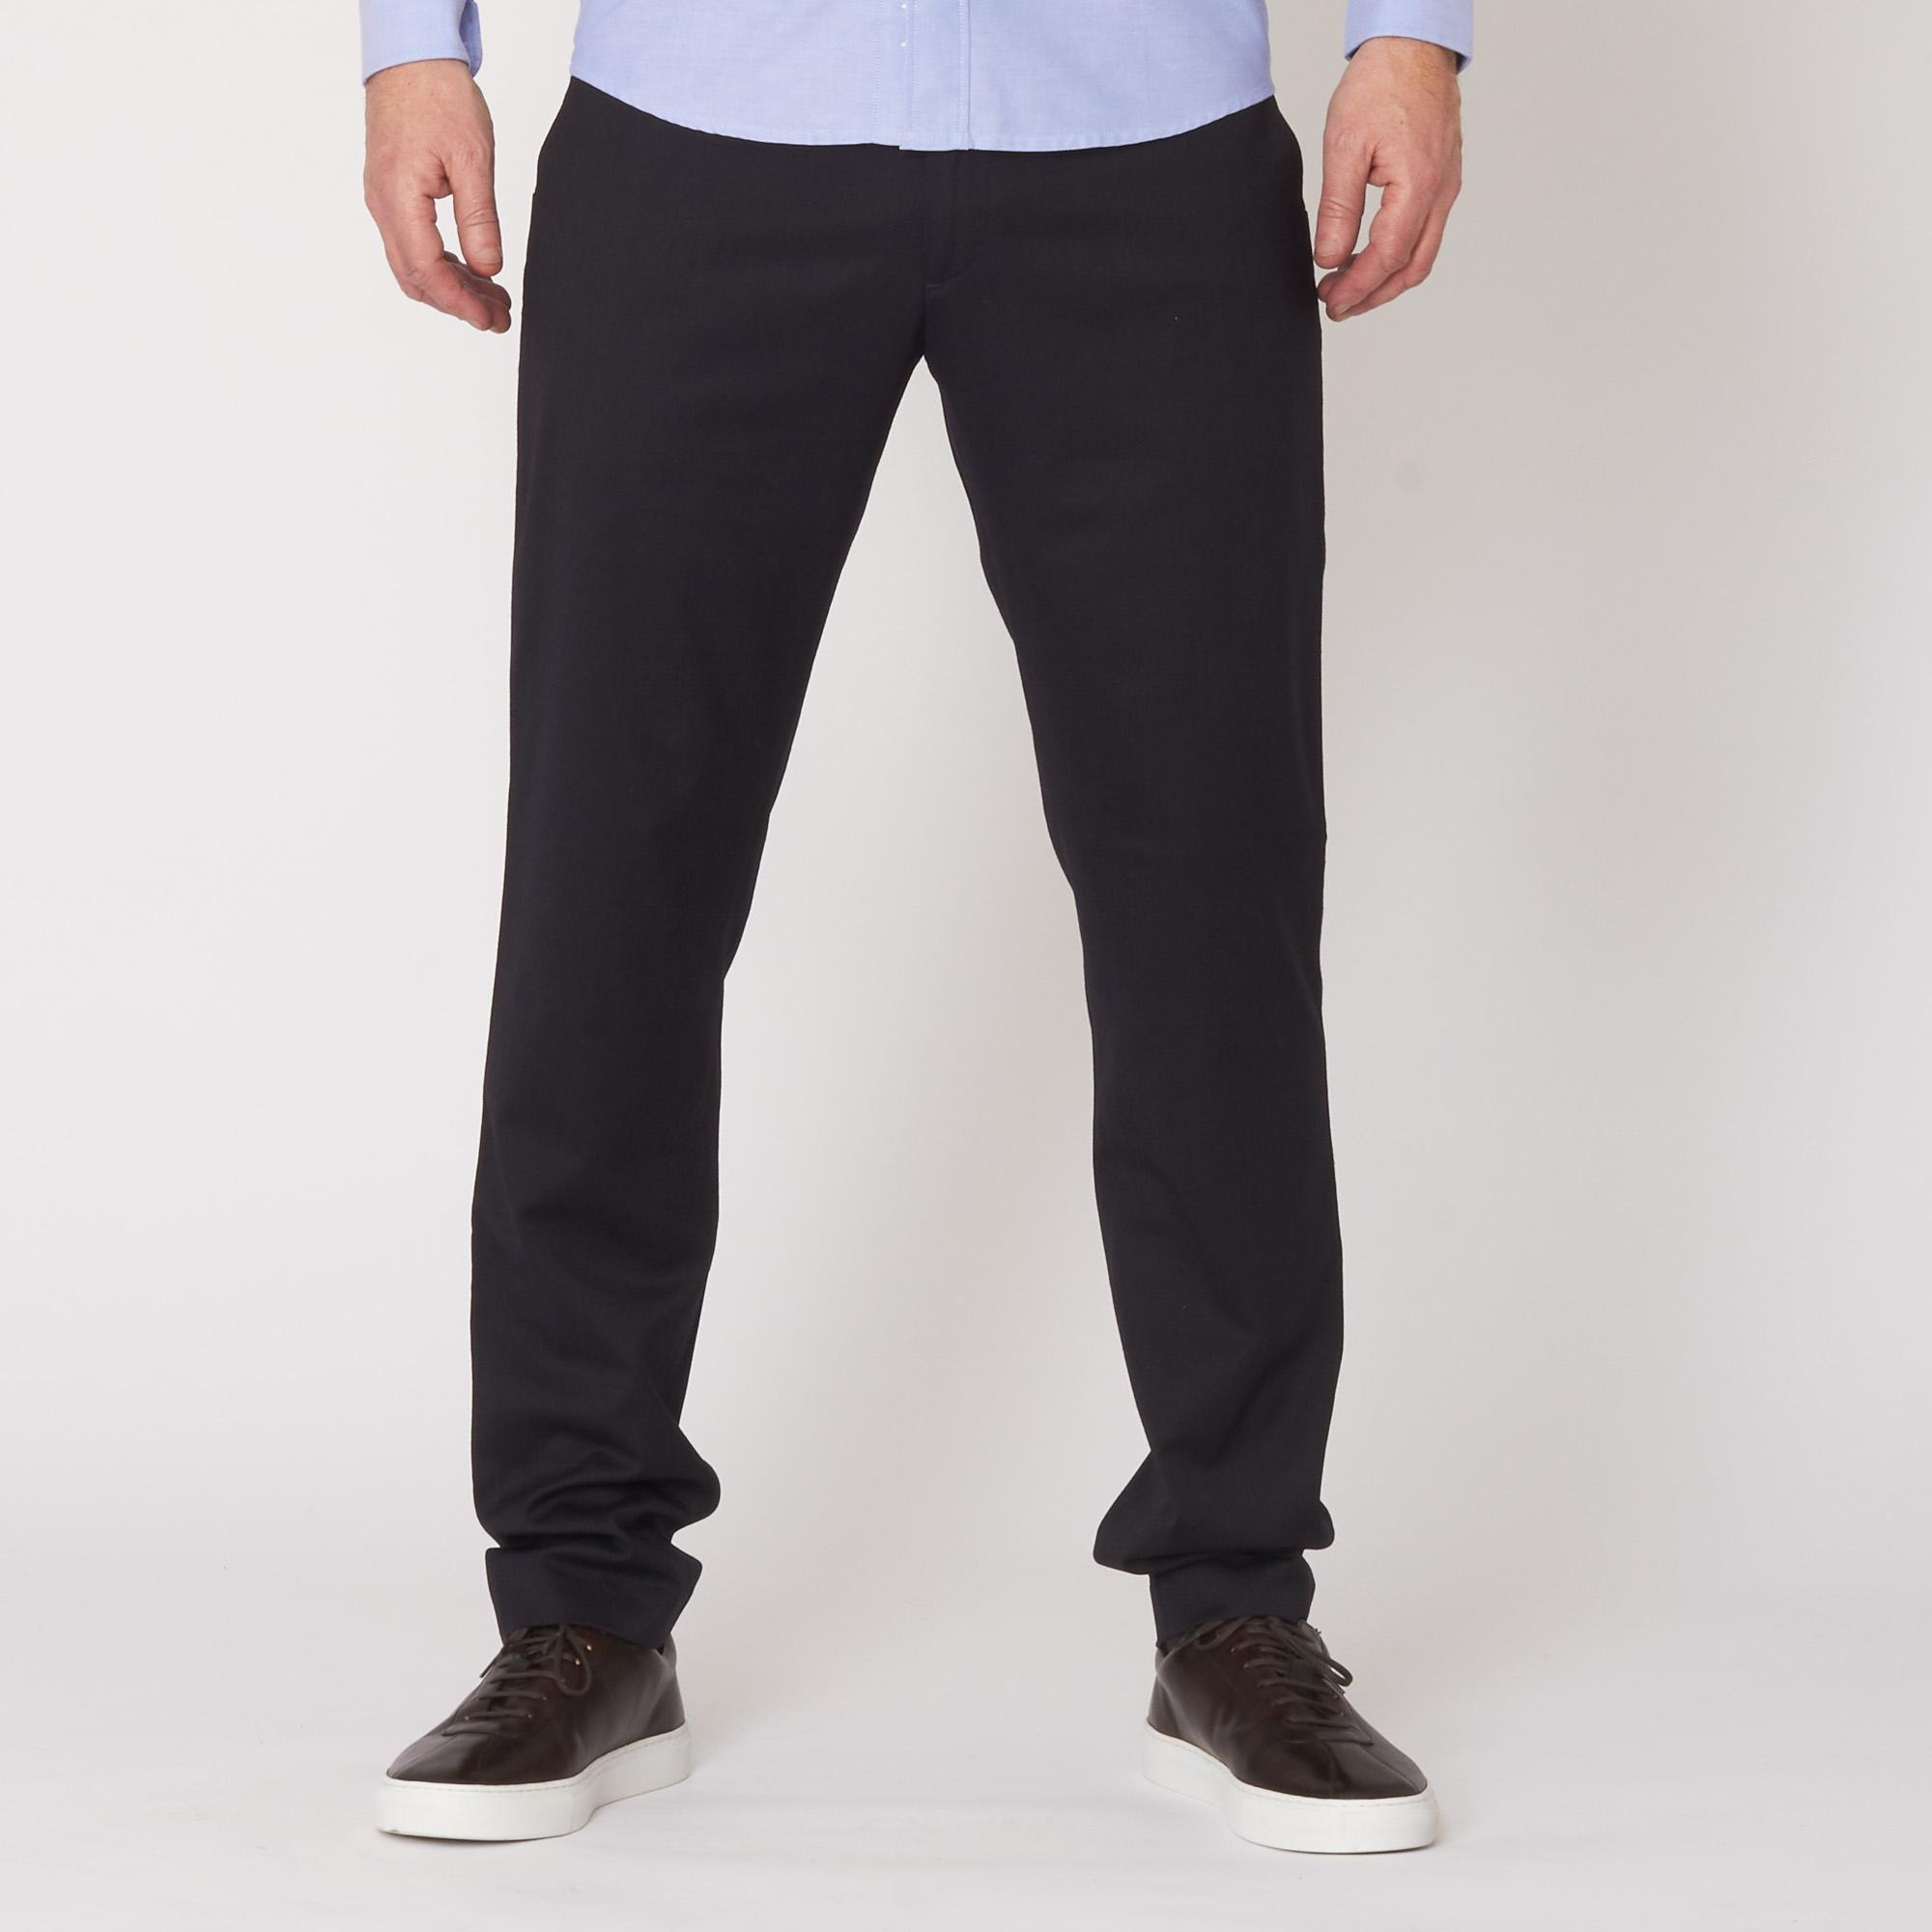 da0bffb843b ... Navy New Theo Trousers - Slim Fit for Men - Lyst. View fullscreen